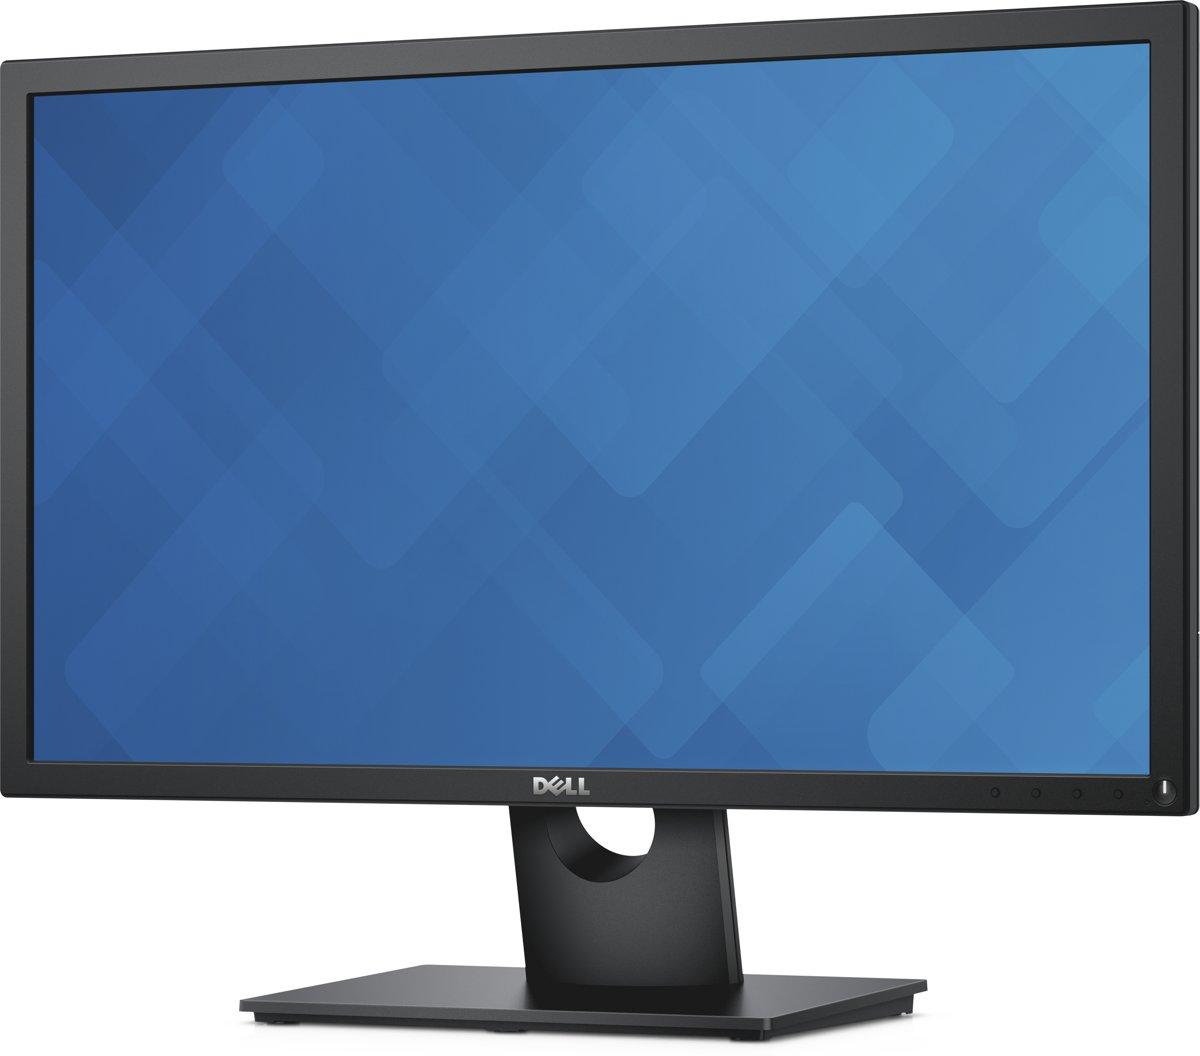 Dell E2417H - Full HD IPS Monitor